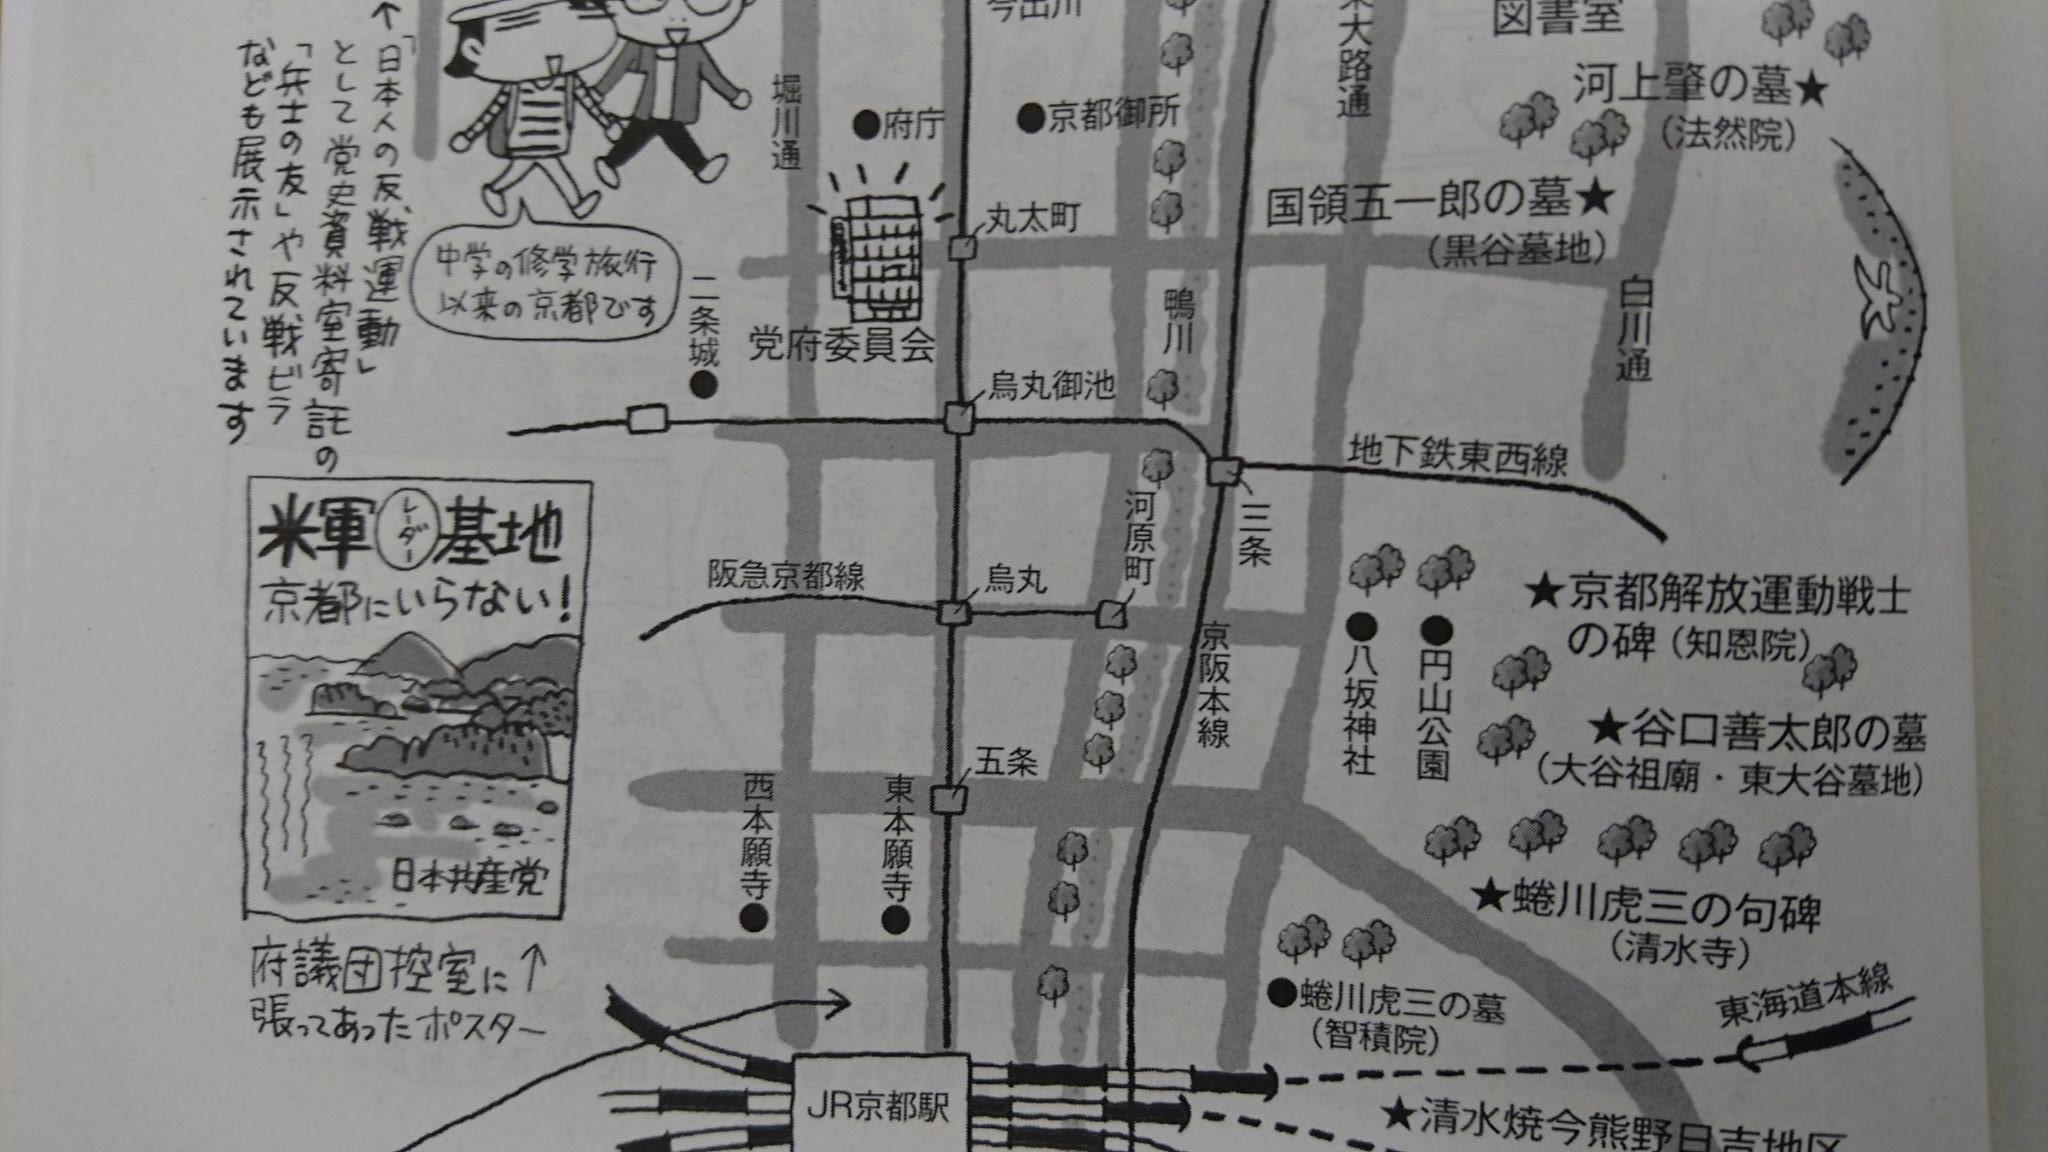 http://www.inoue-satoshi.com/diary/%E5%9C%B0%E5%9B%B3%20%282%29.jpg